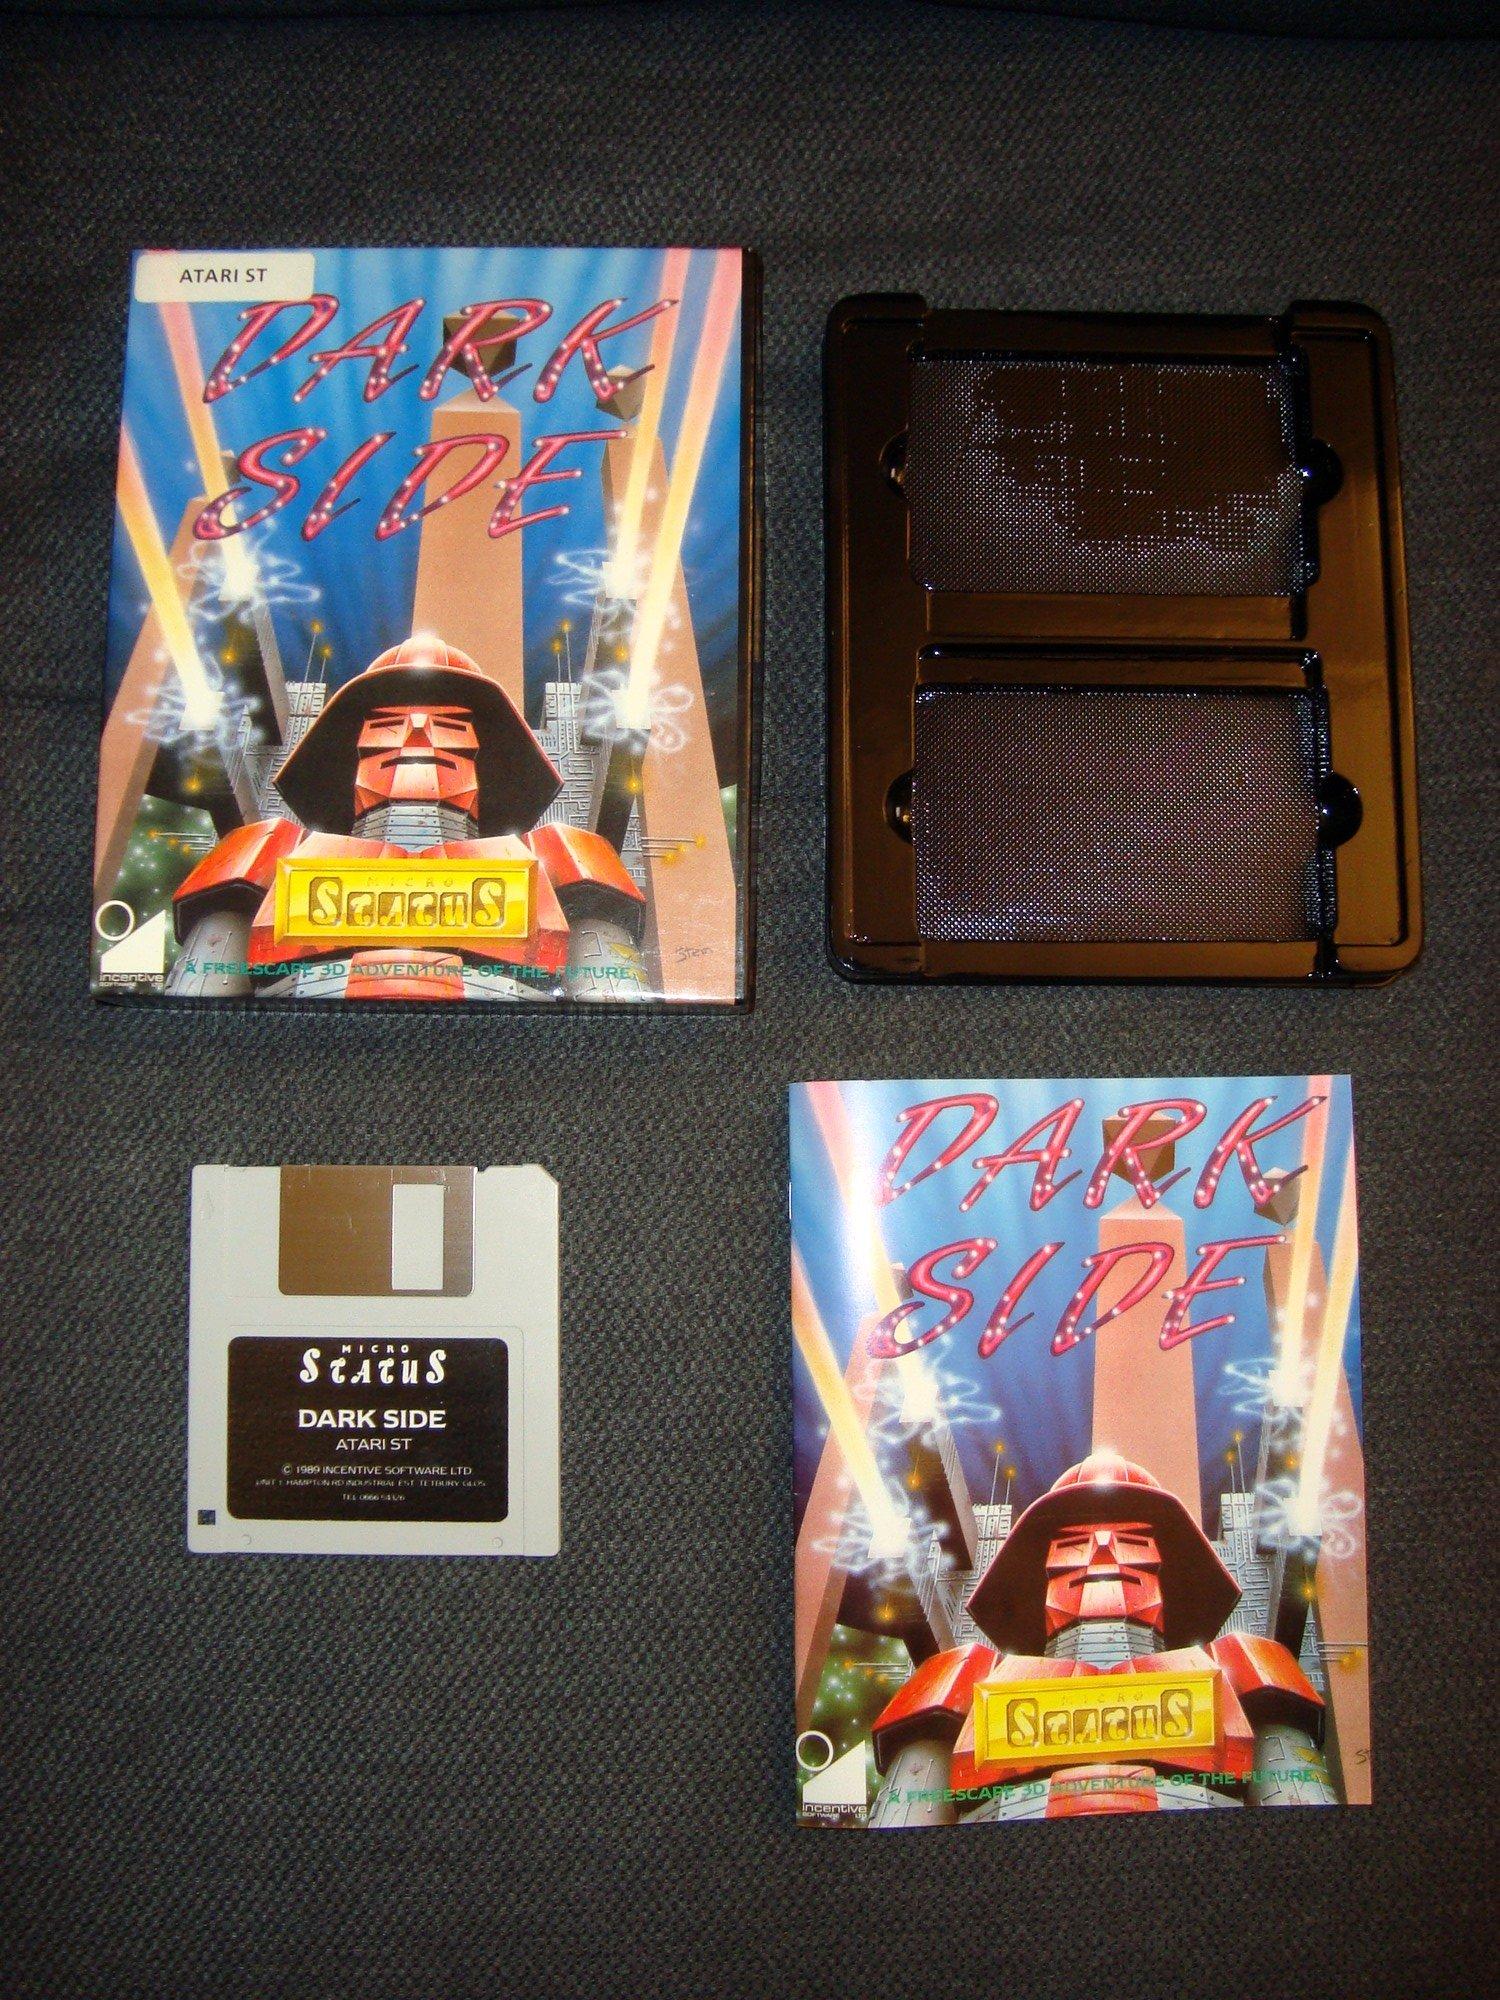 [TEST] Dark Side - Atari ST 201206050344109869